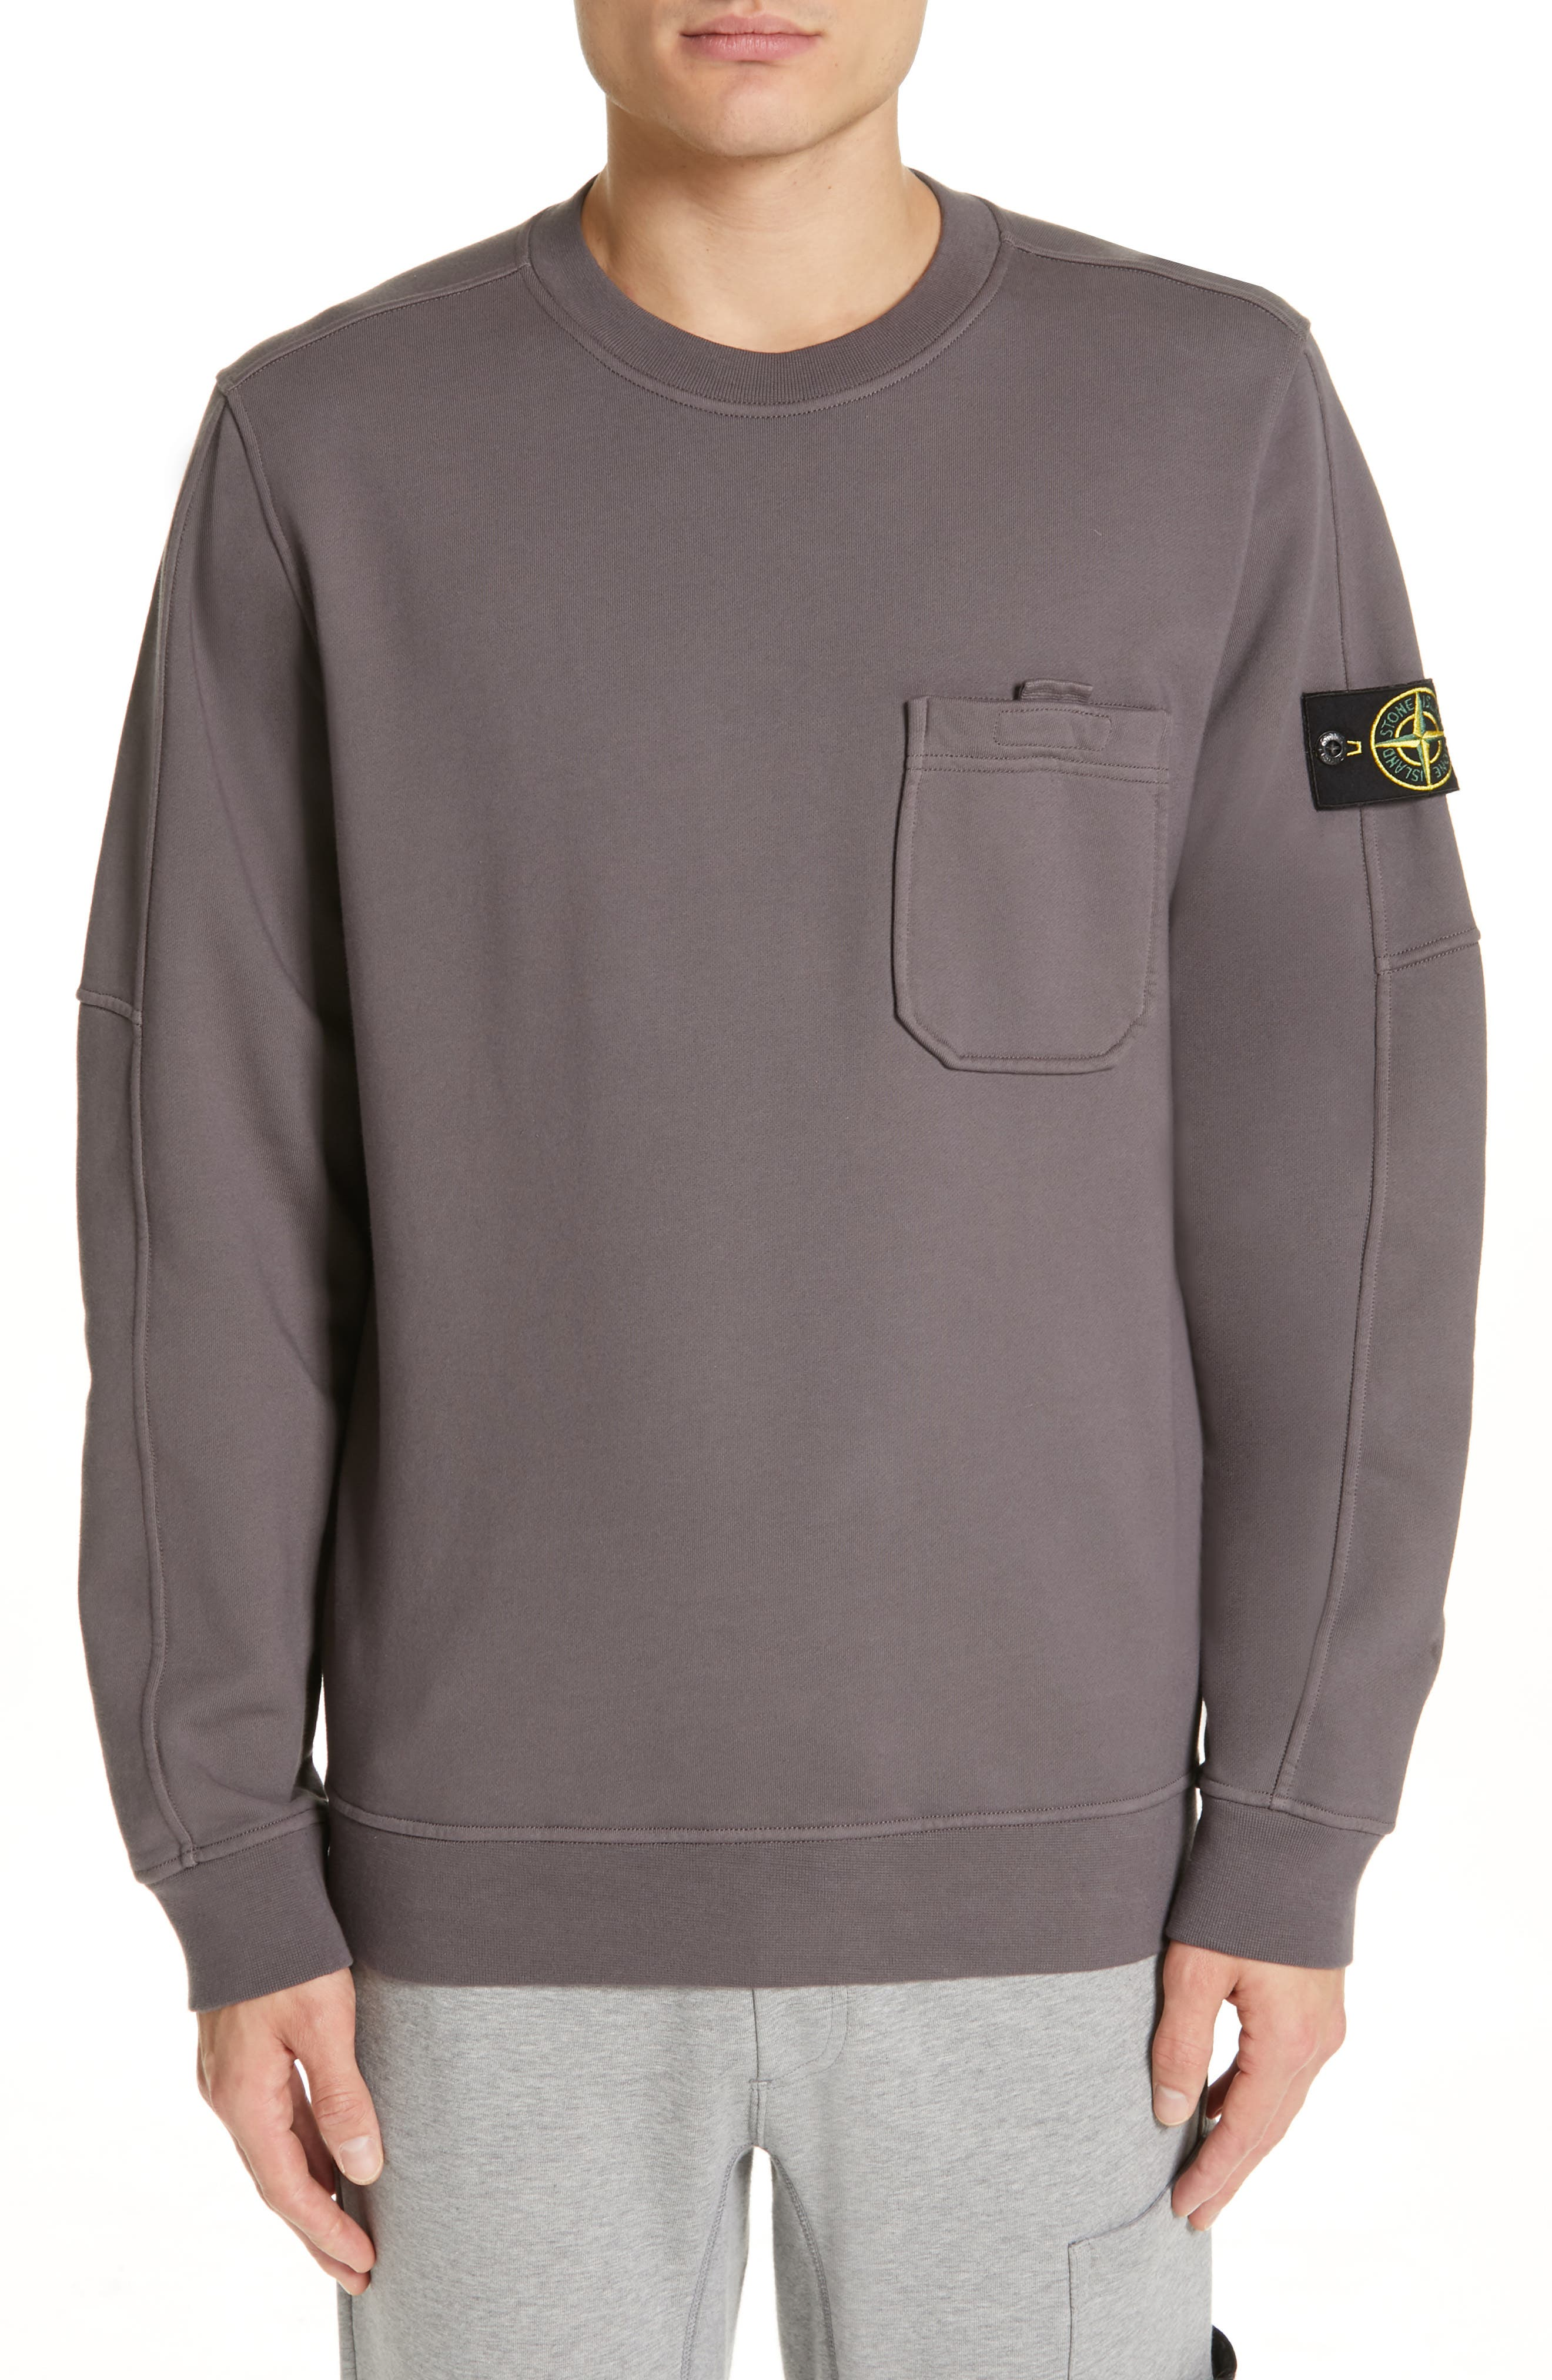 STONE ISLAND, Pocket Sweatshirt, Main thumbnail 1, color, BLUE